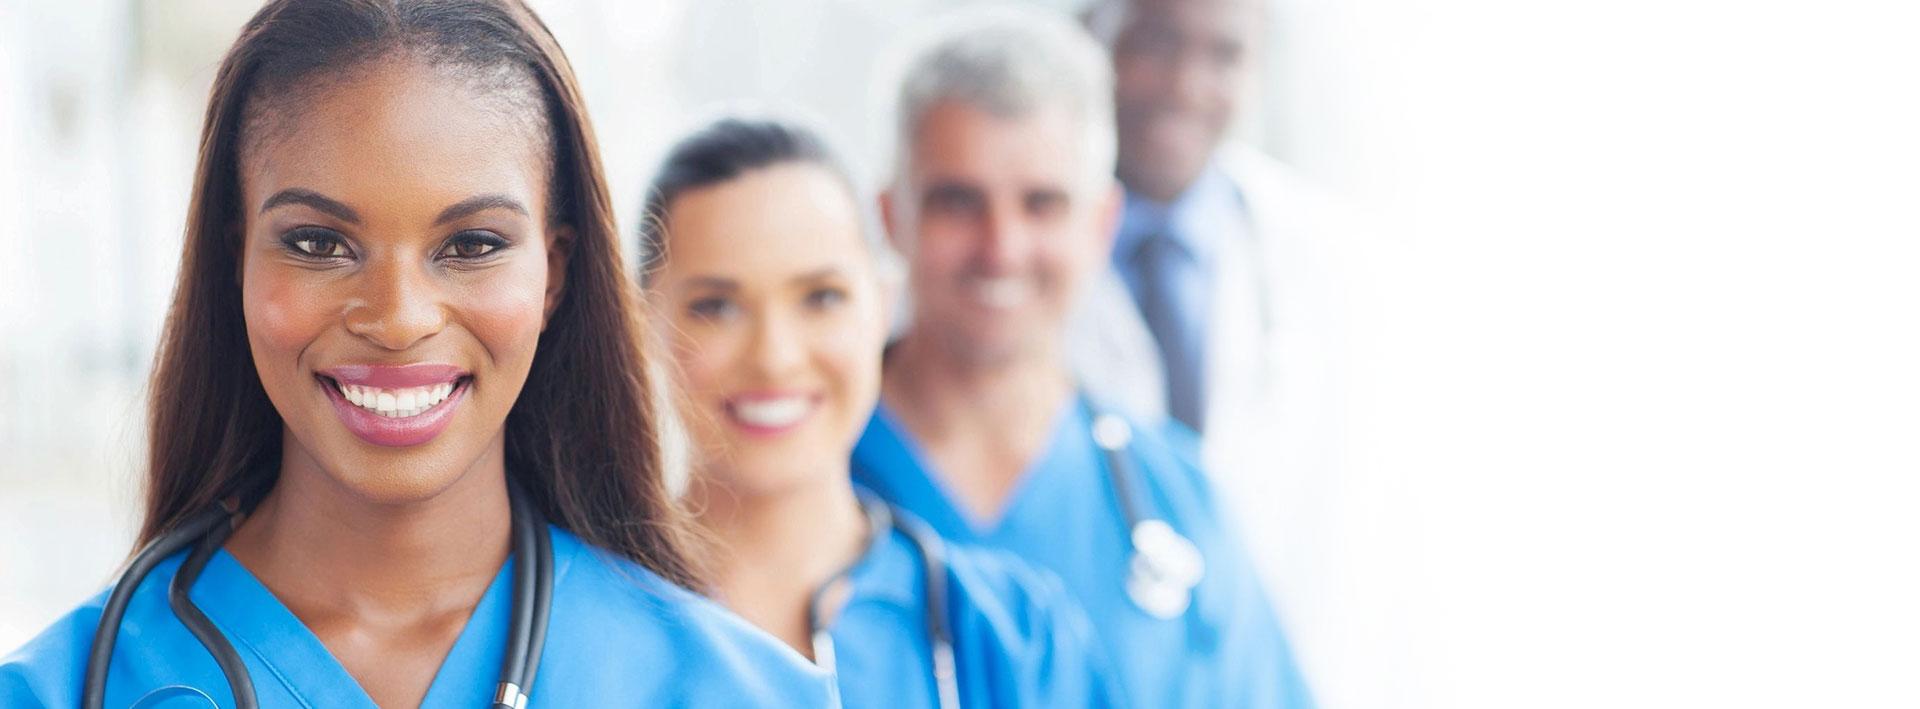 National Training Institute for HealthCare Technicians L.L.C.